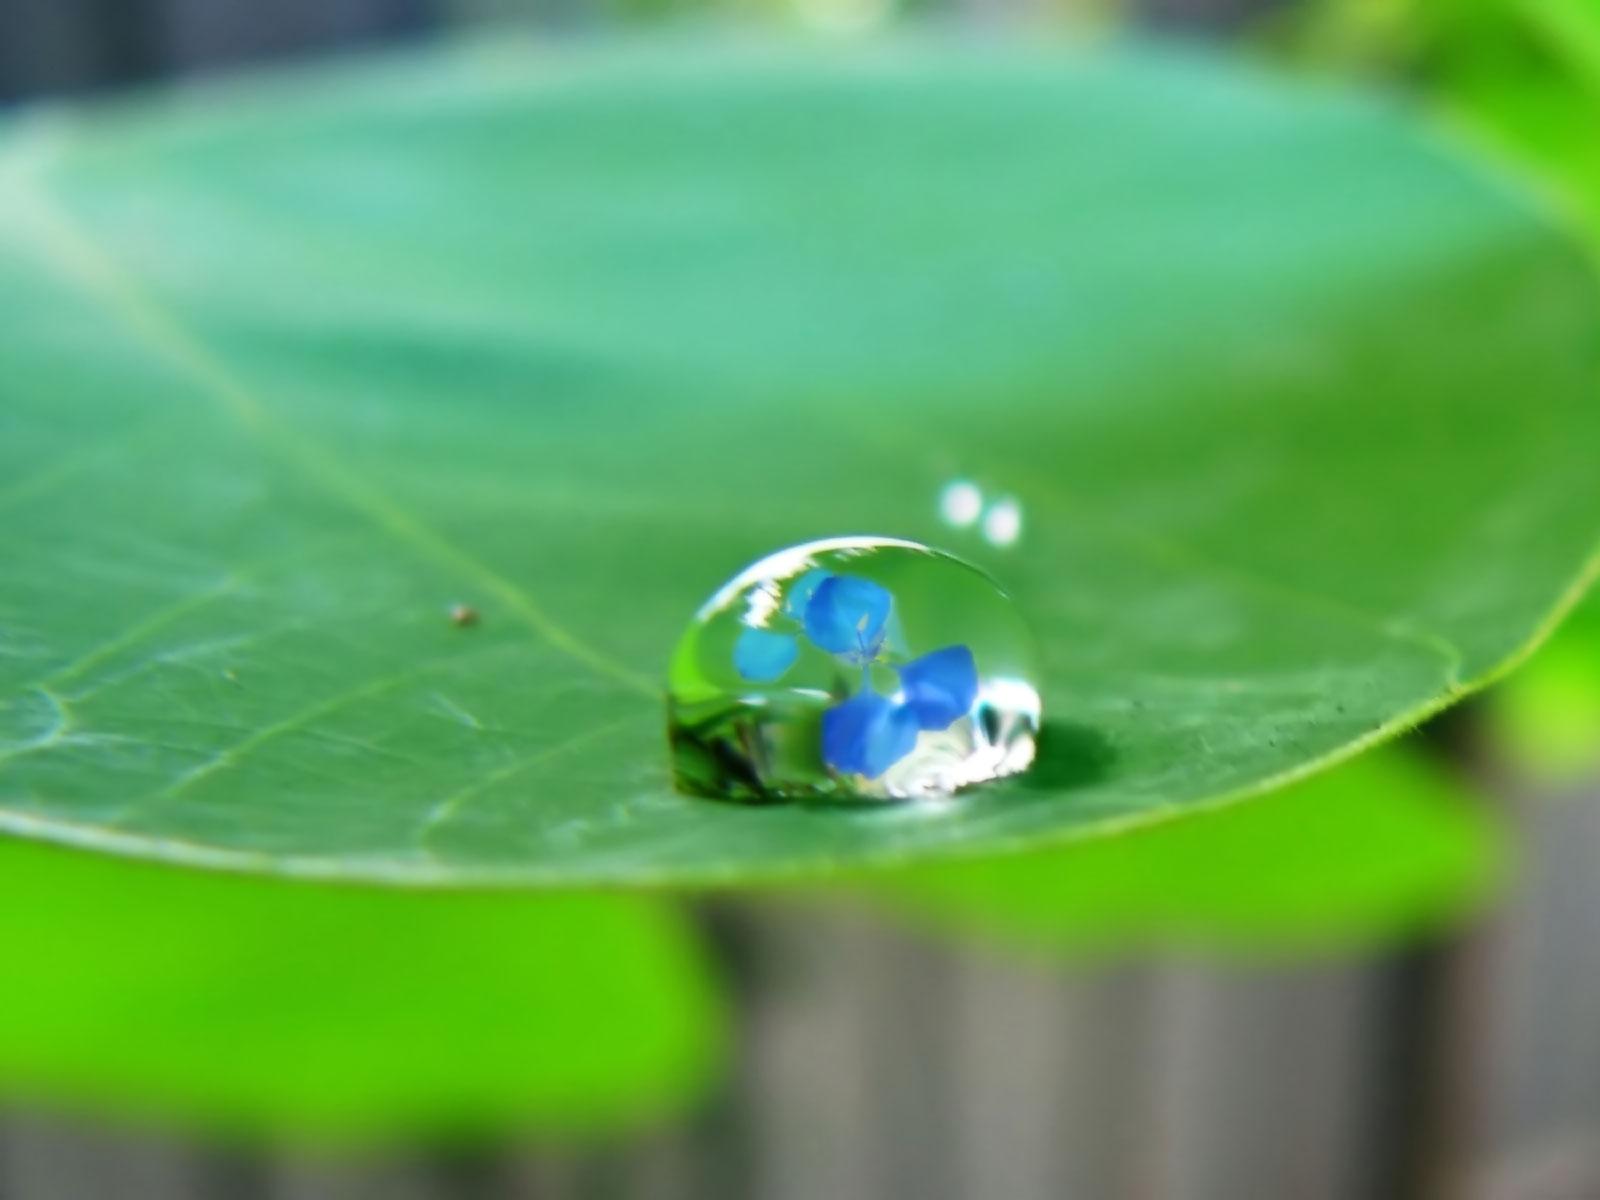 ws_Water_drop_on_leaf_1600x1200